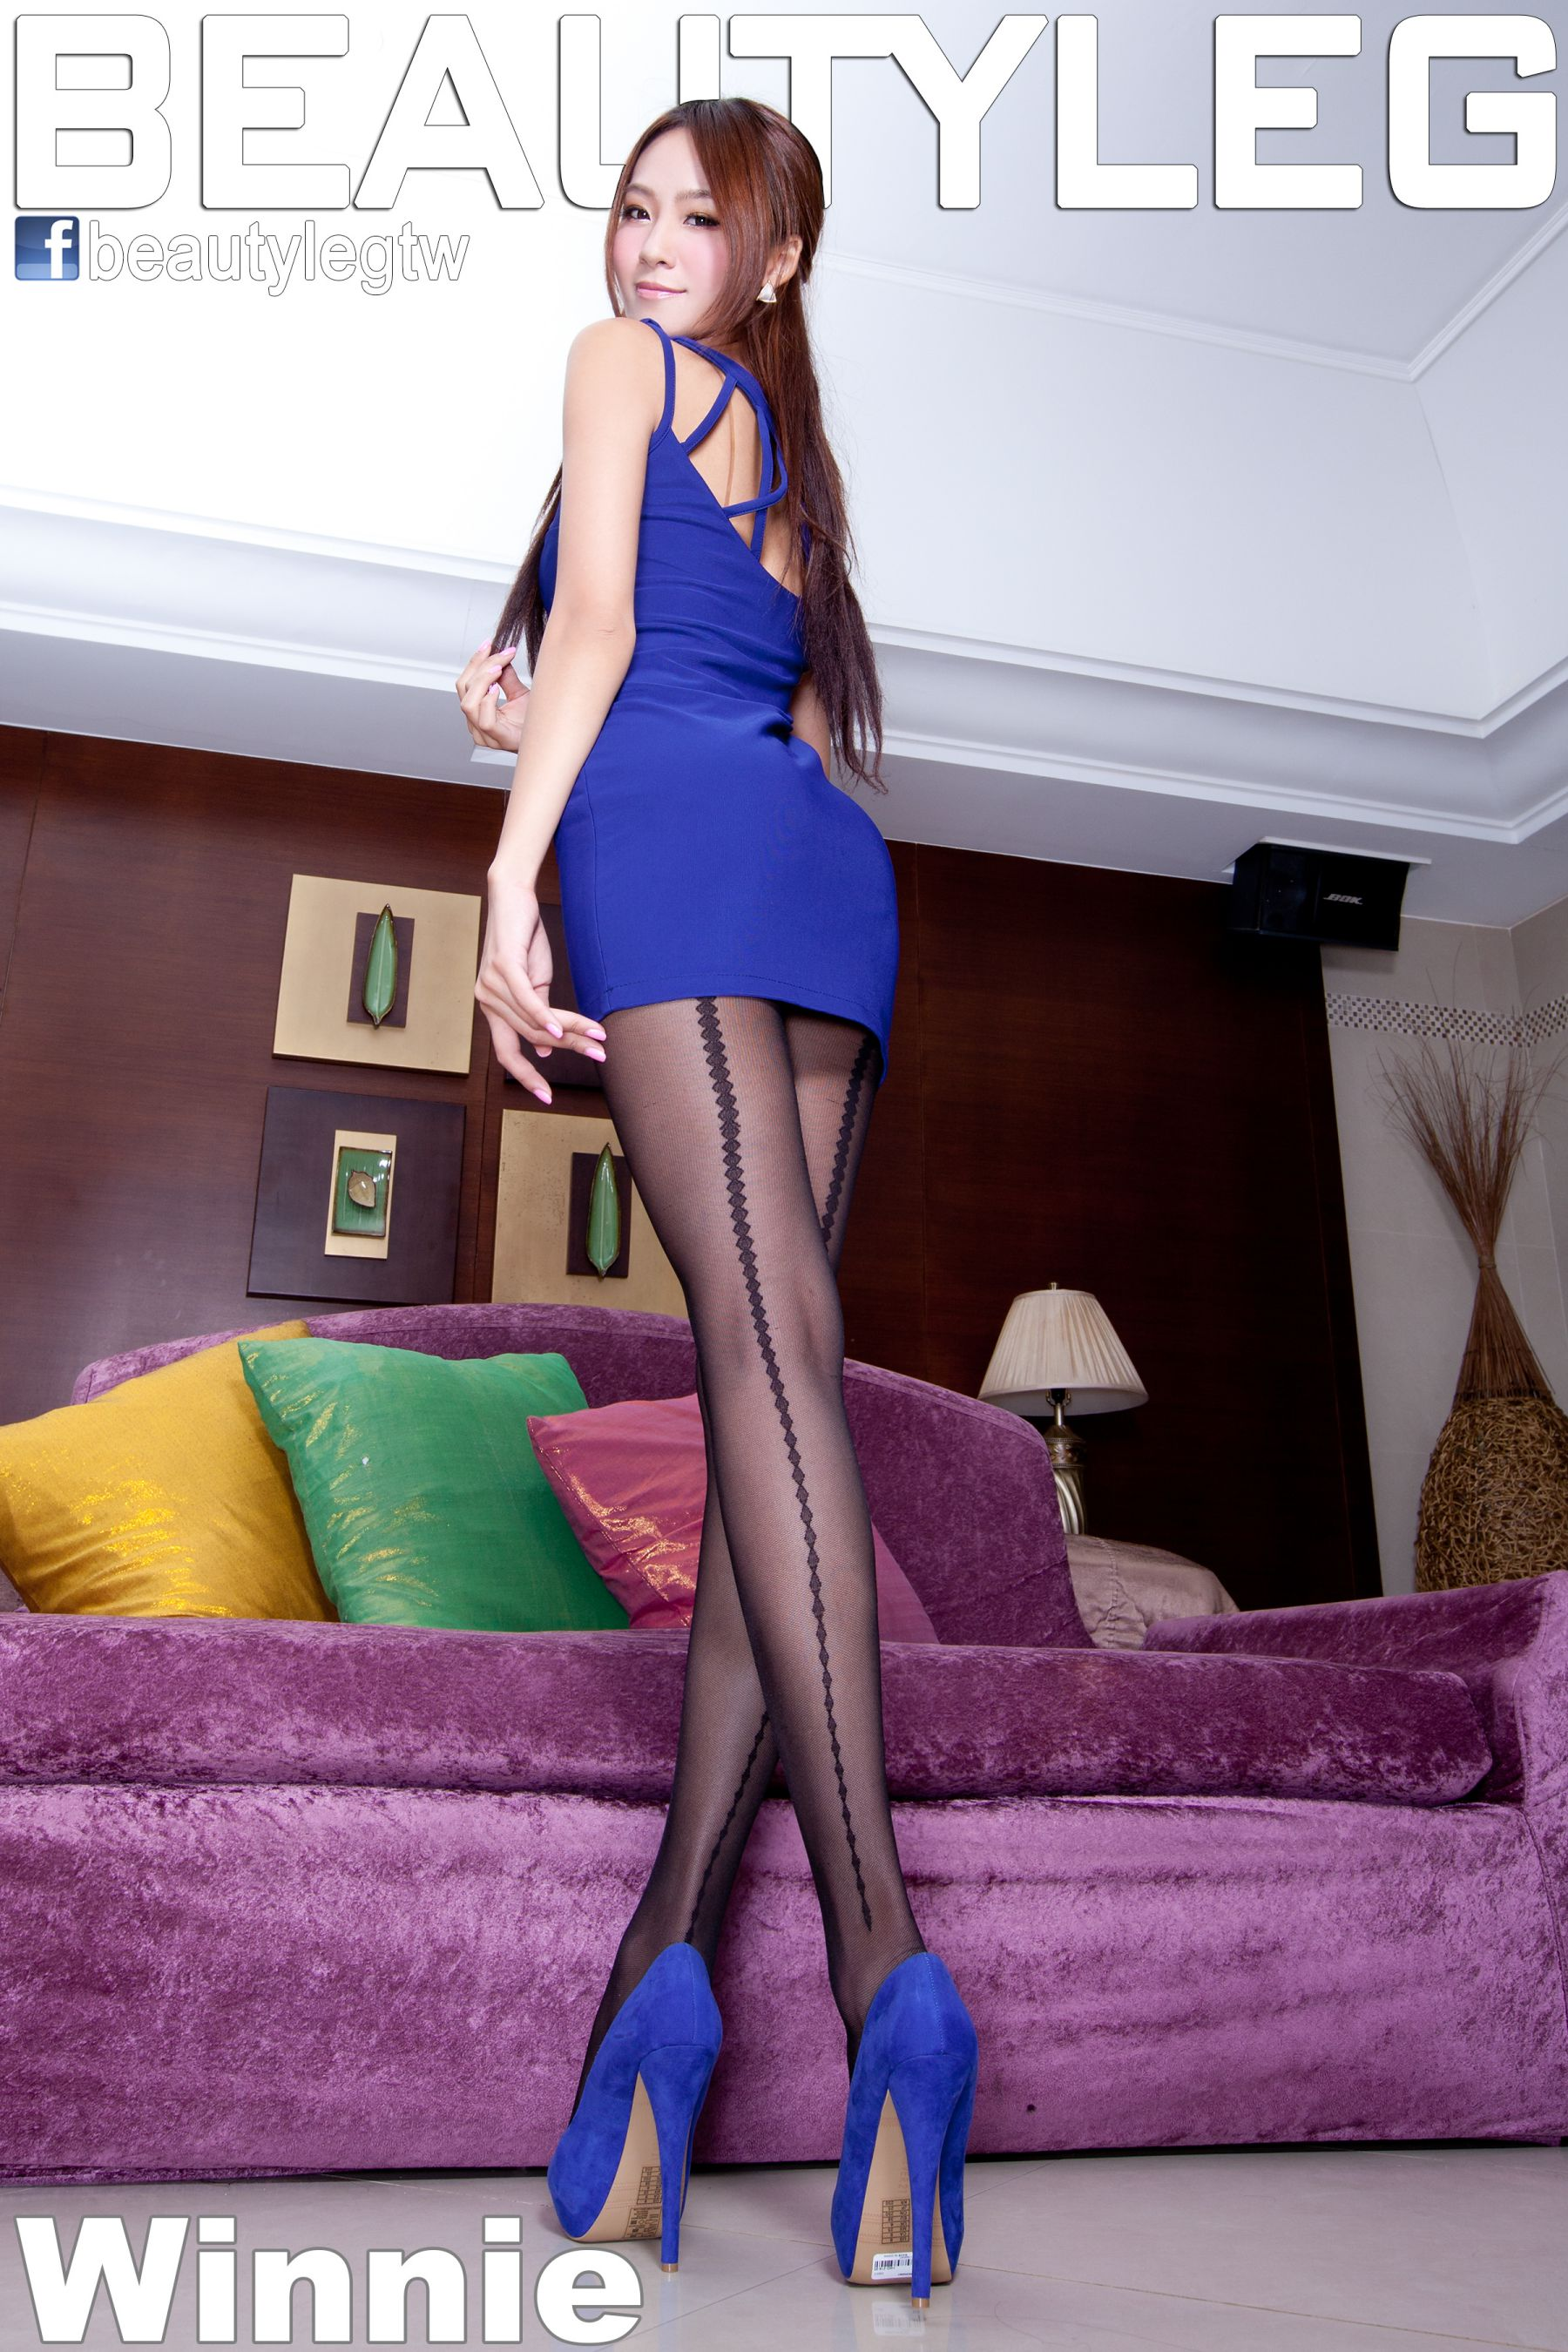 VOL.1242 [Beautyleg]丝袜美腿黑丝包臀裙美女:Winnie小雪(庄咏惠,庄温妮,腿模Winnie)高品质写真套图(64P)